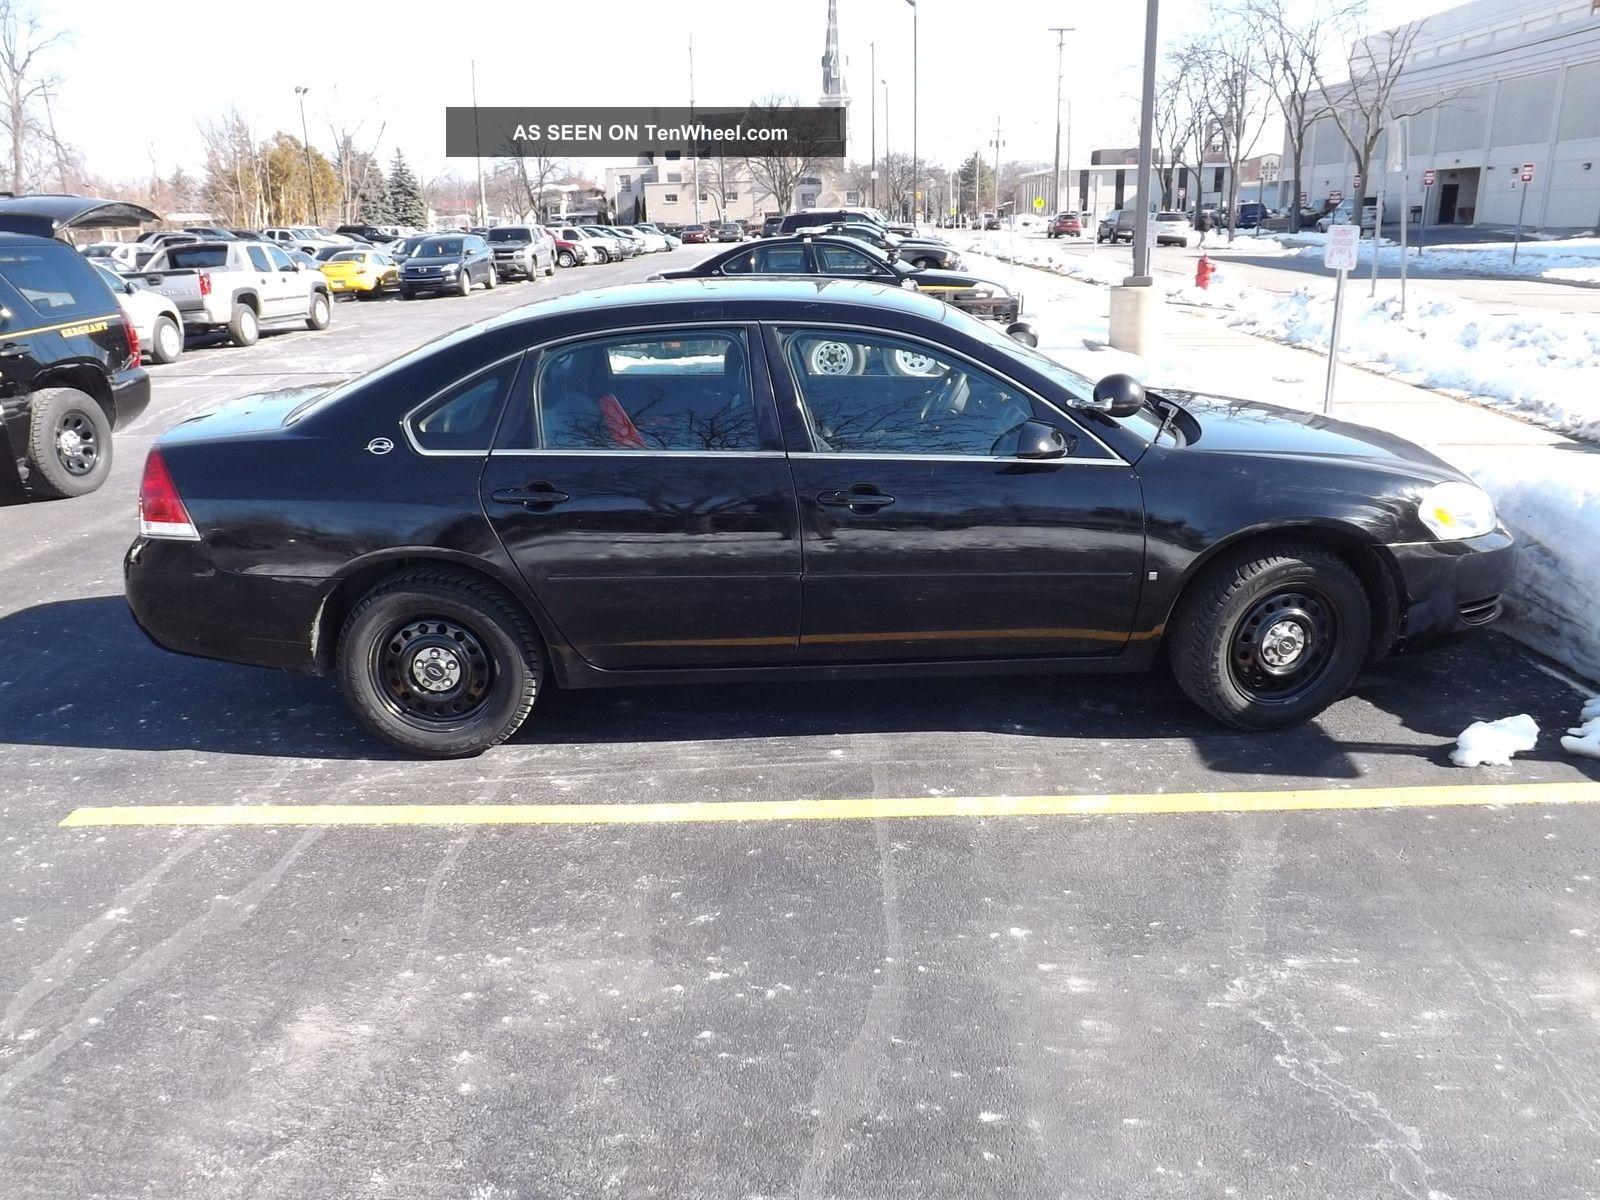 2007 chevrolet impala police sedan 4 door 3 9l impala photo 2